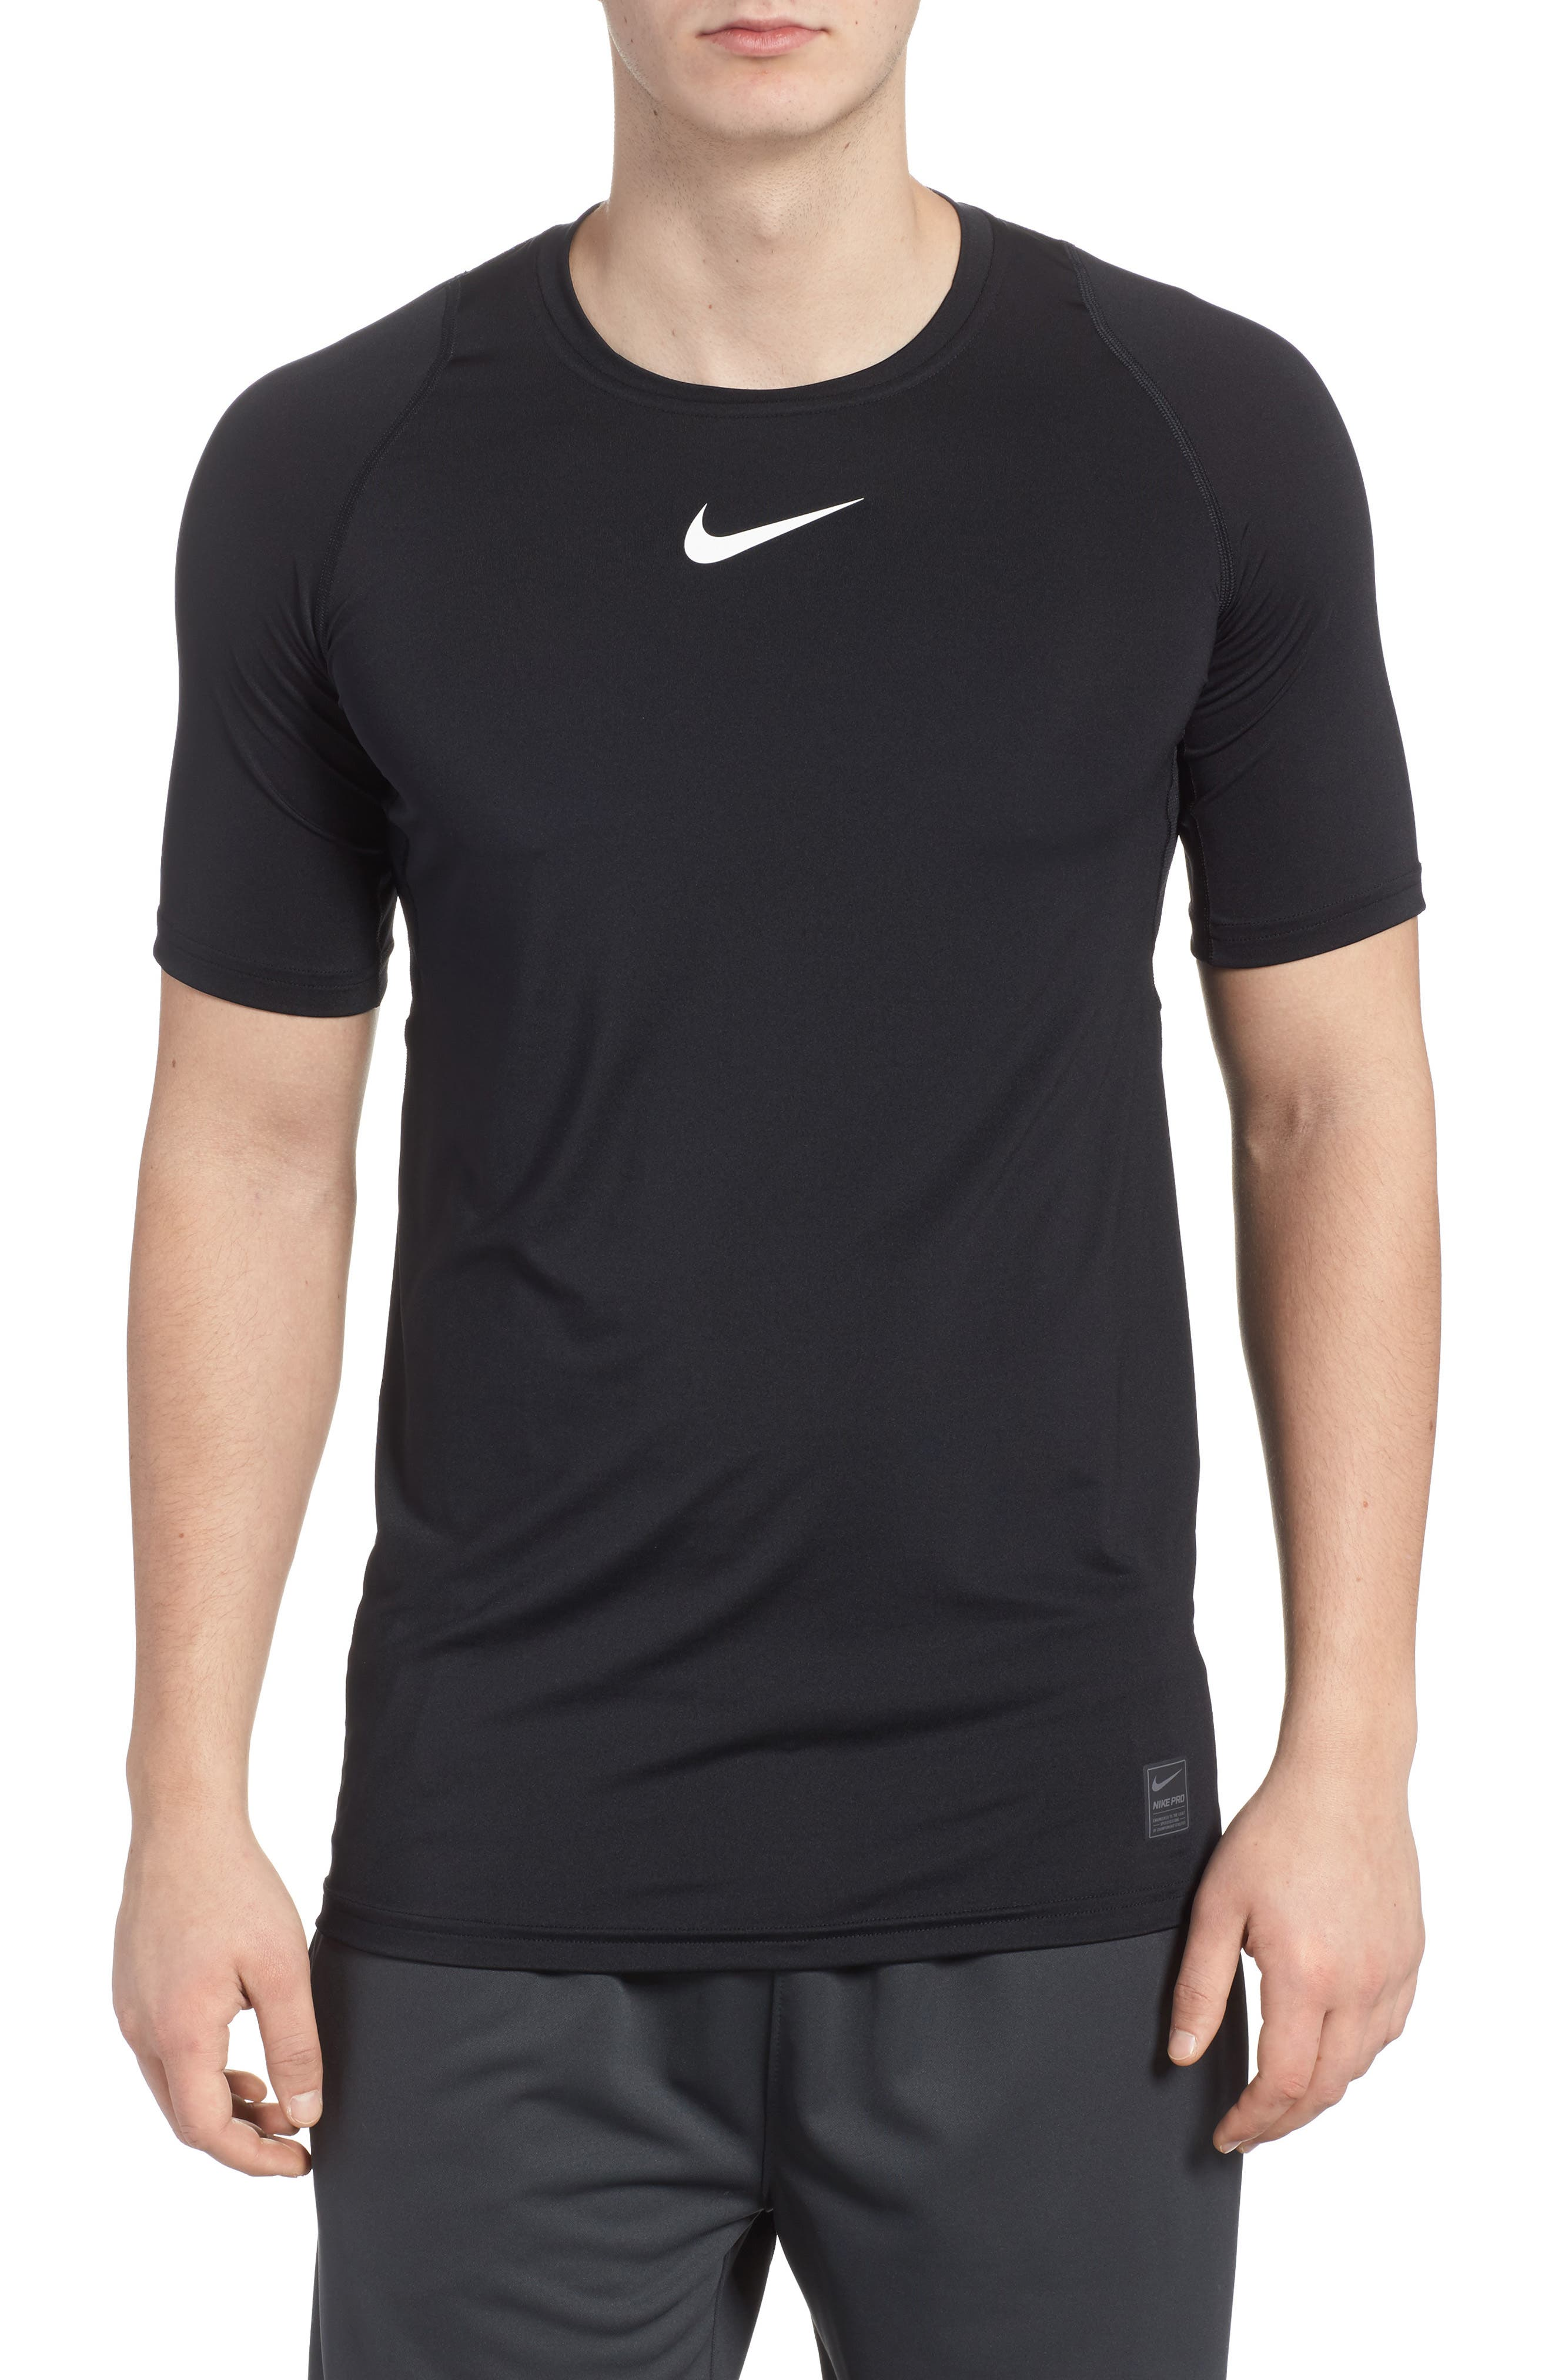 Pro Fitted T-Shirt,                             Main thumbnail 1, color,                             Black/White/White